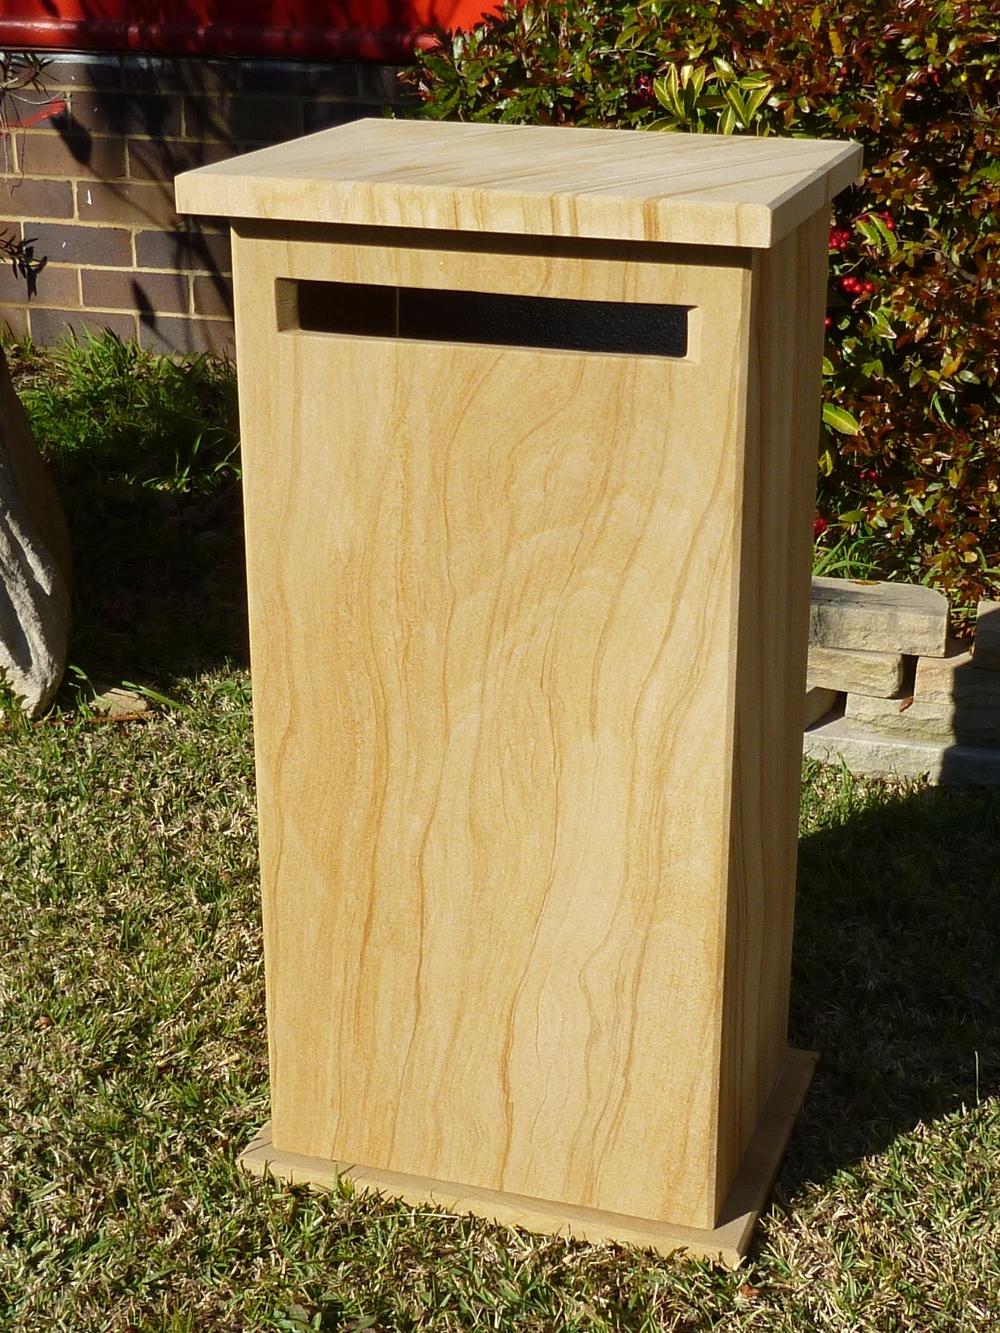 009 custom made letterbox .JPG